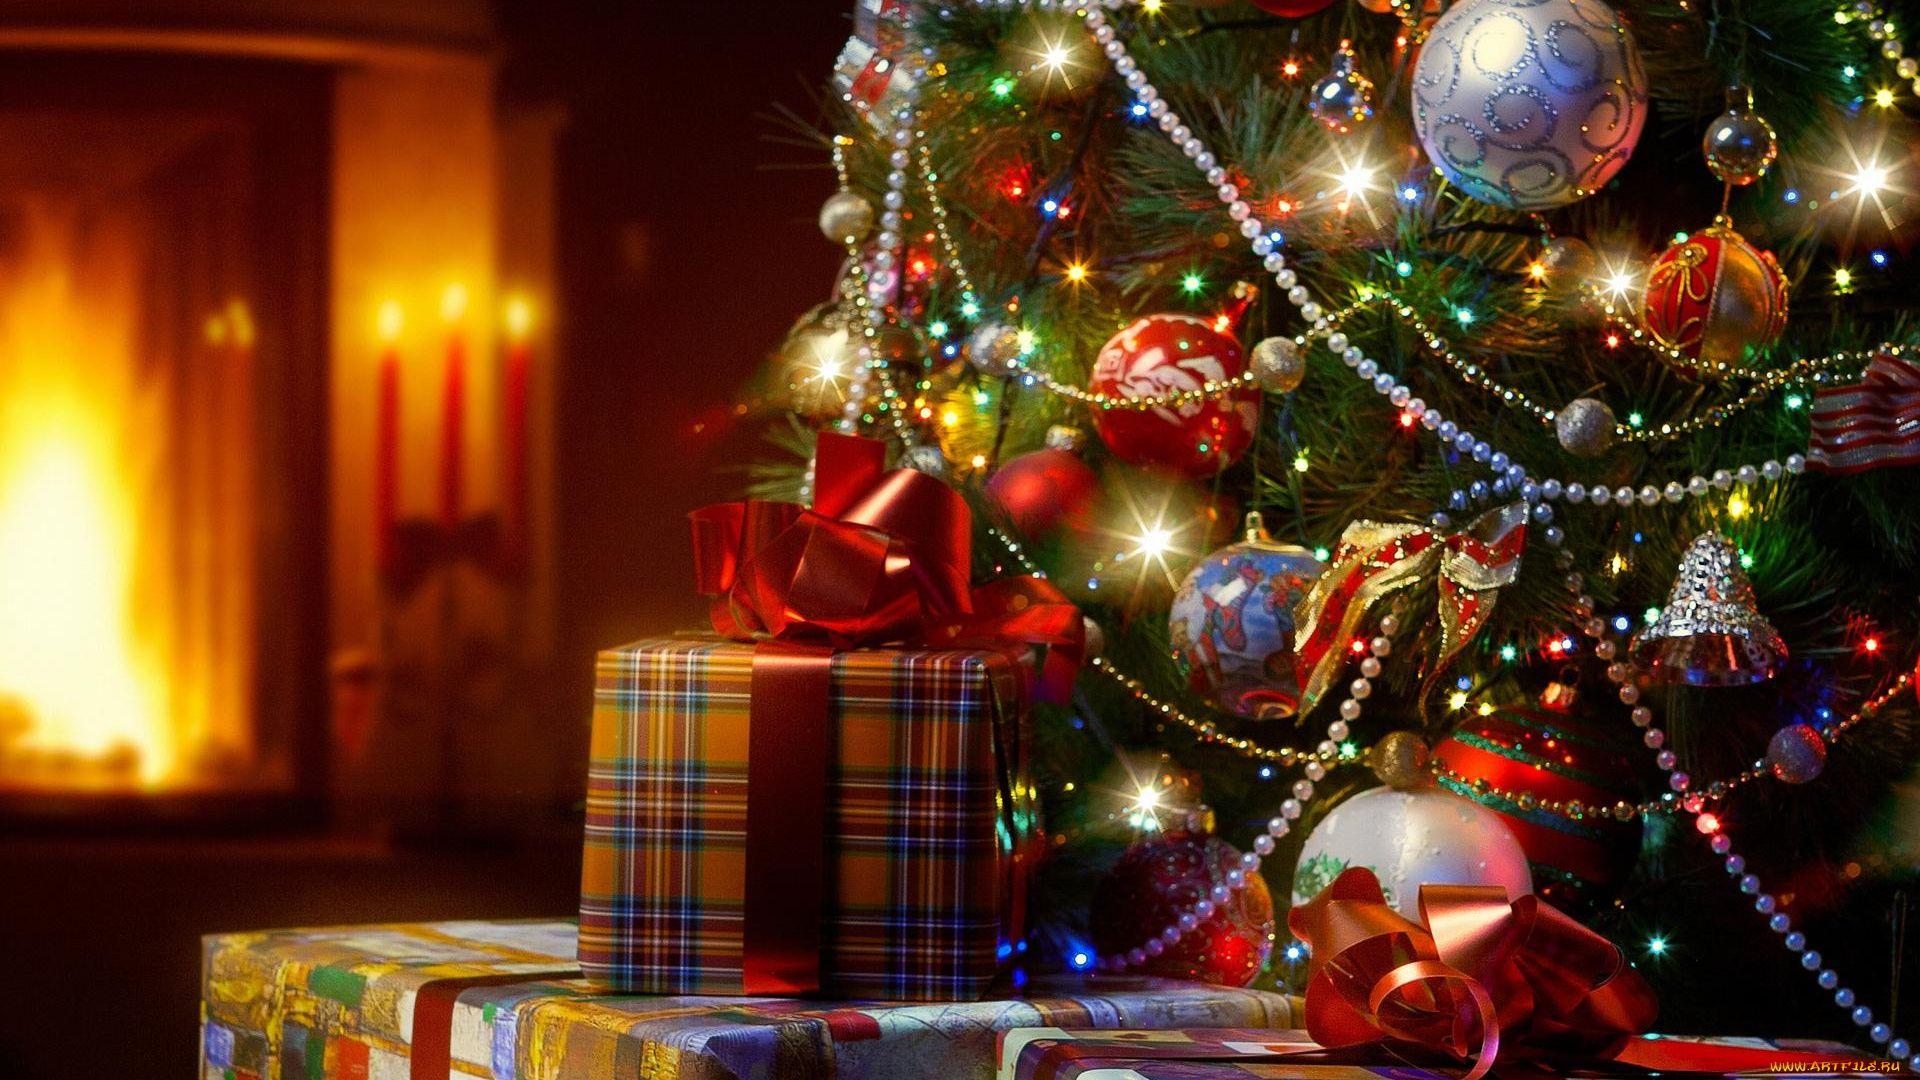 Christmas Tree wallpaper image hd